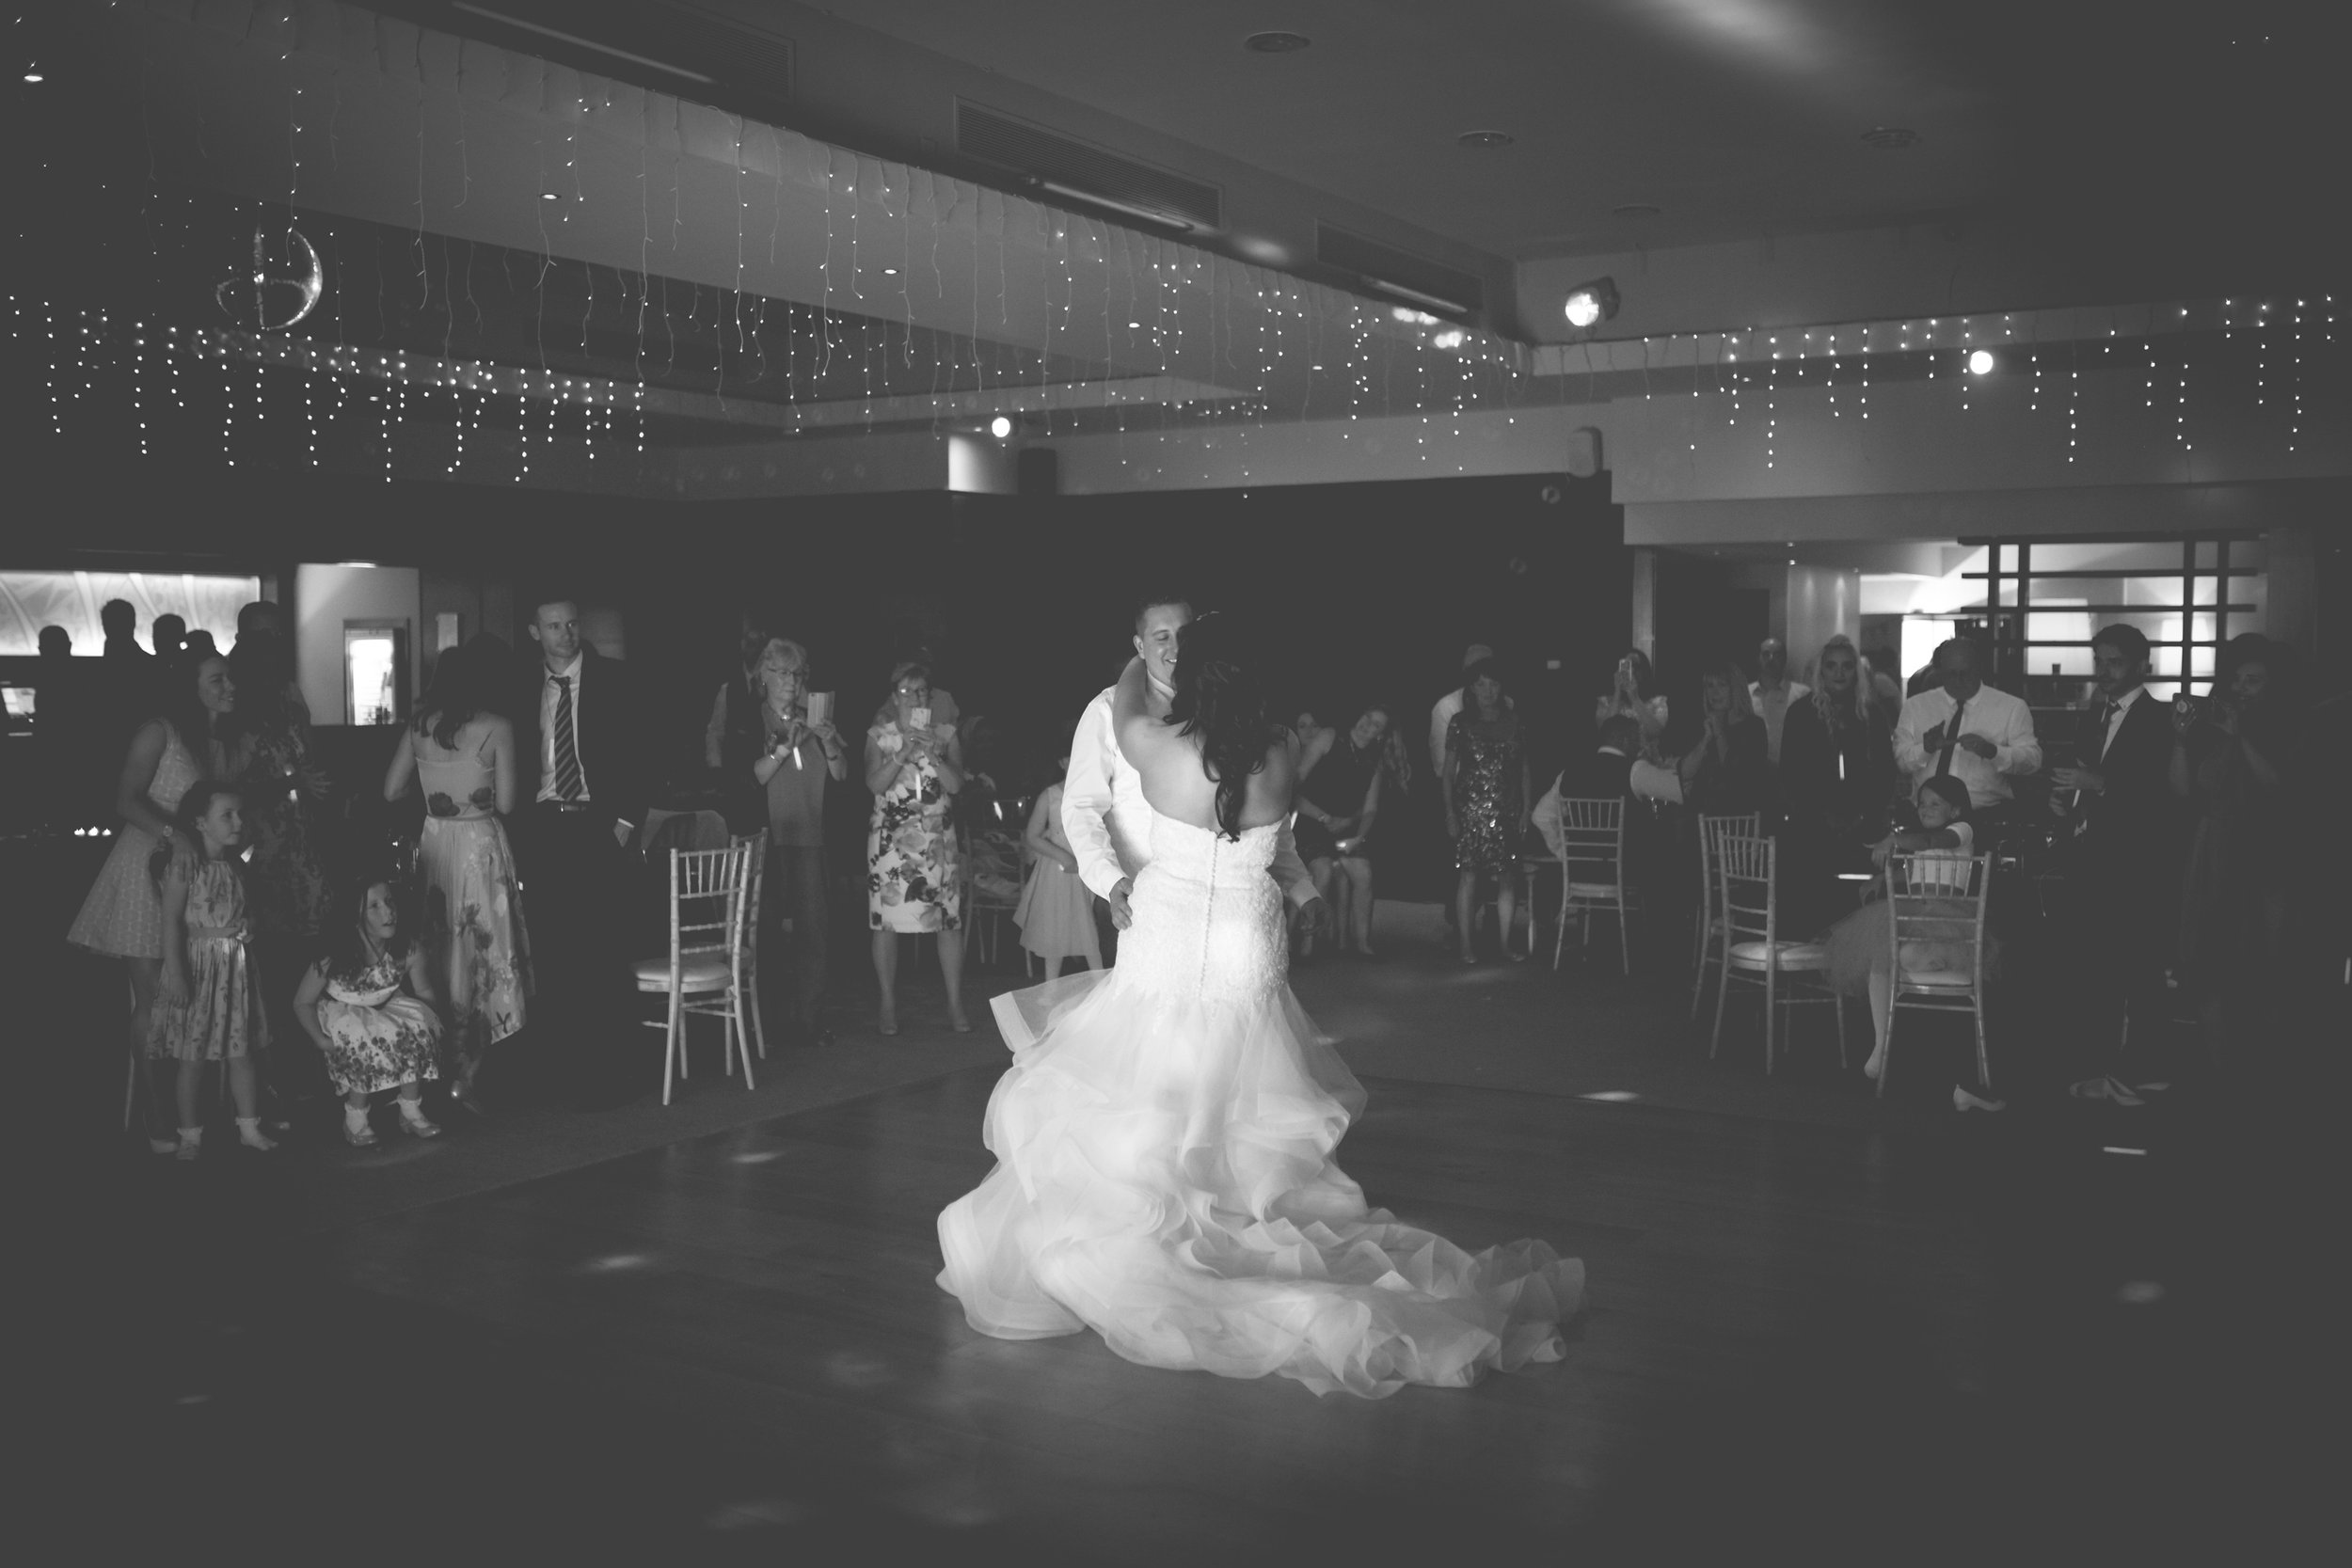 Helena & Terence - First Dance-15.jpg